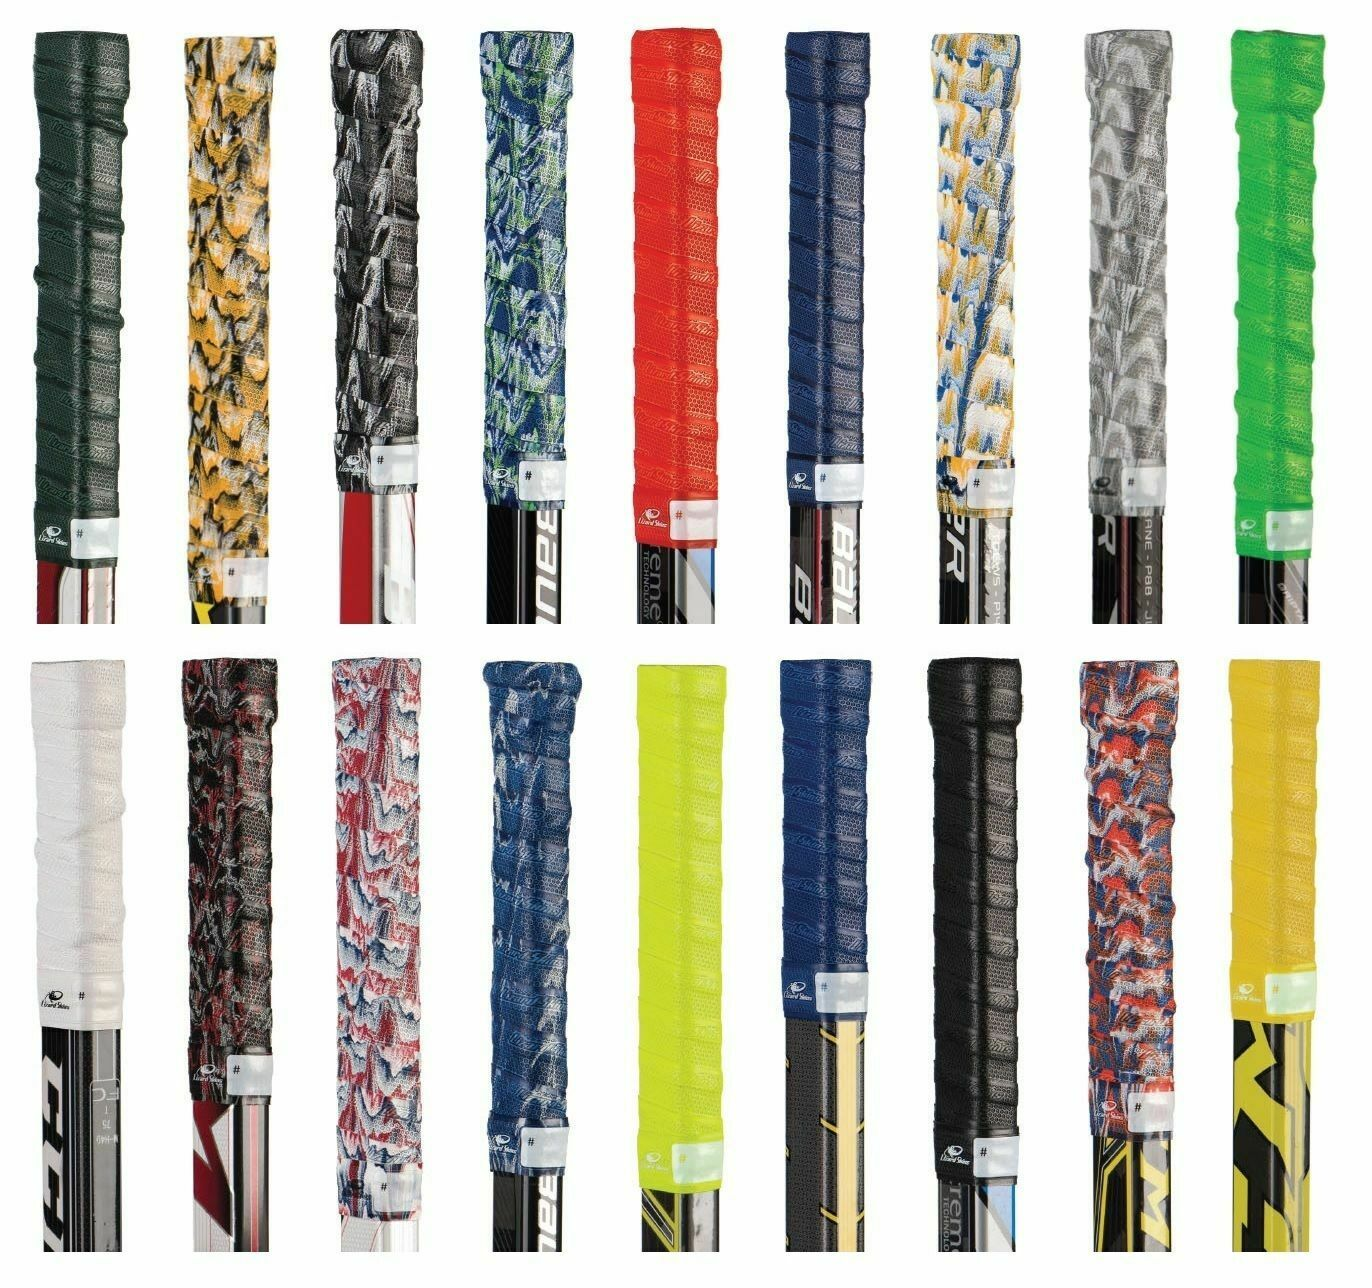 Lizard Skins Hockey Stick Handle Sticky Grip Colored DSP Wra